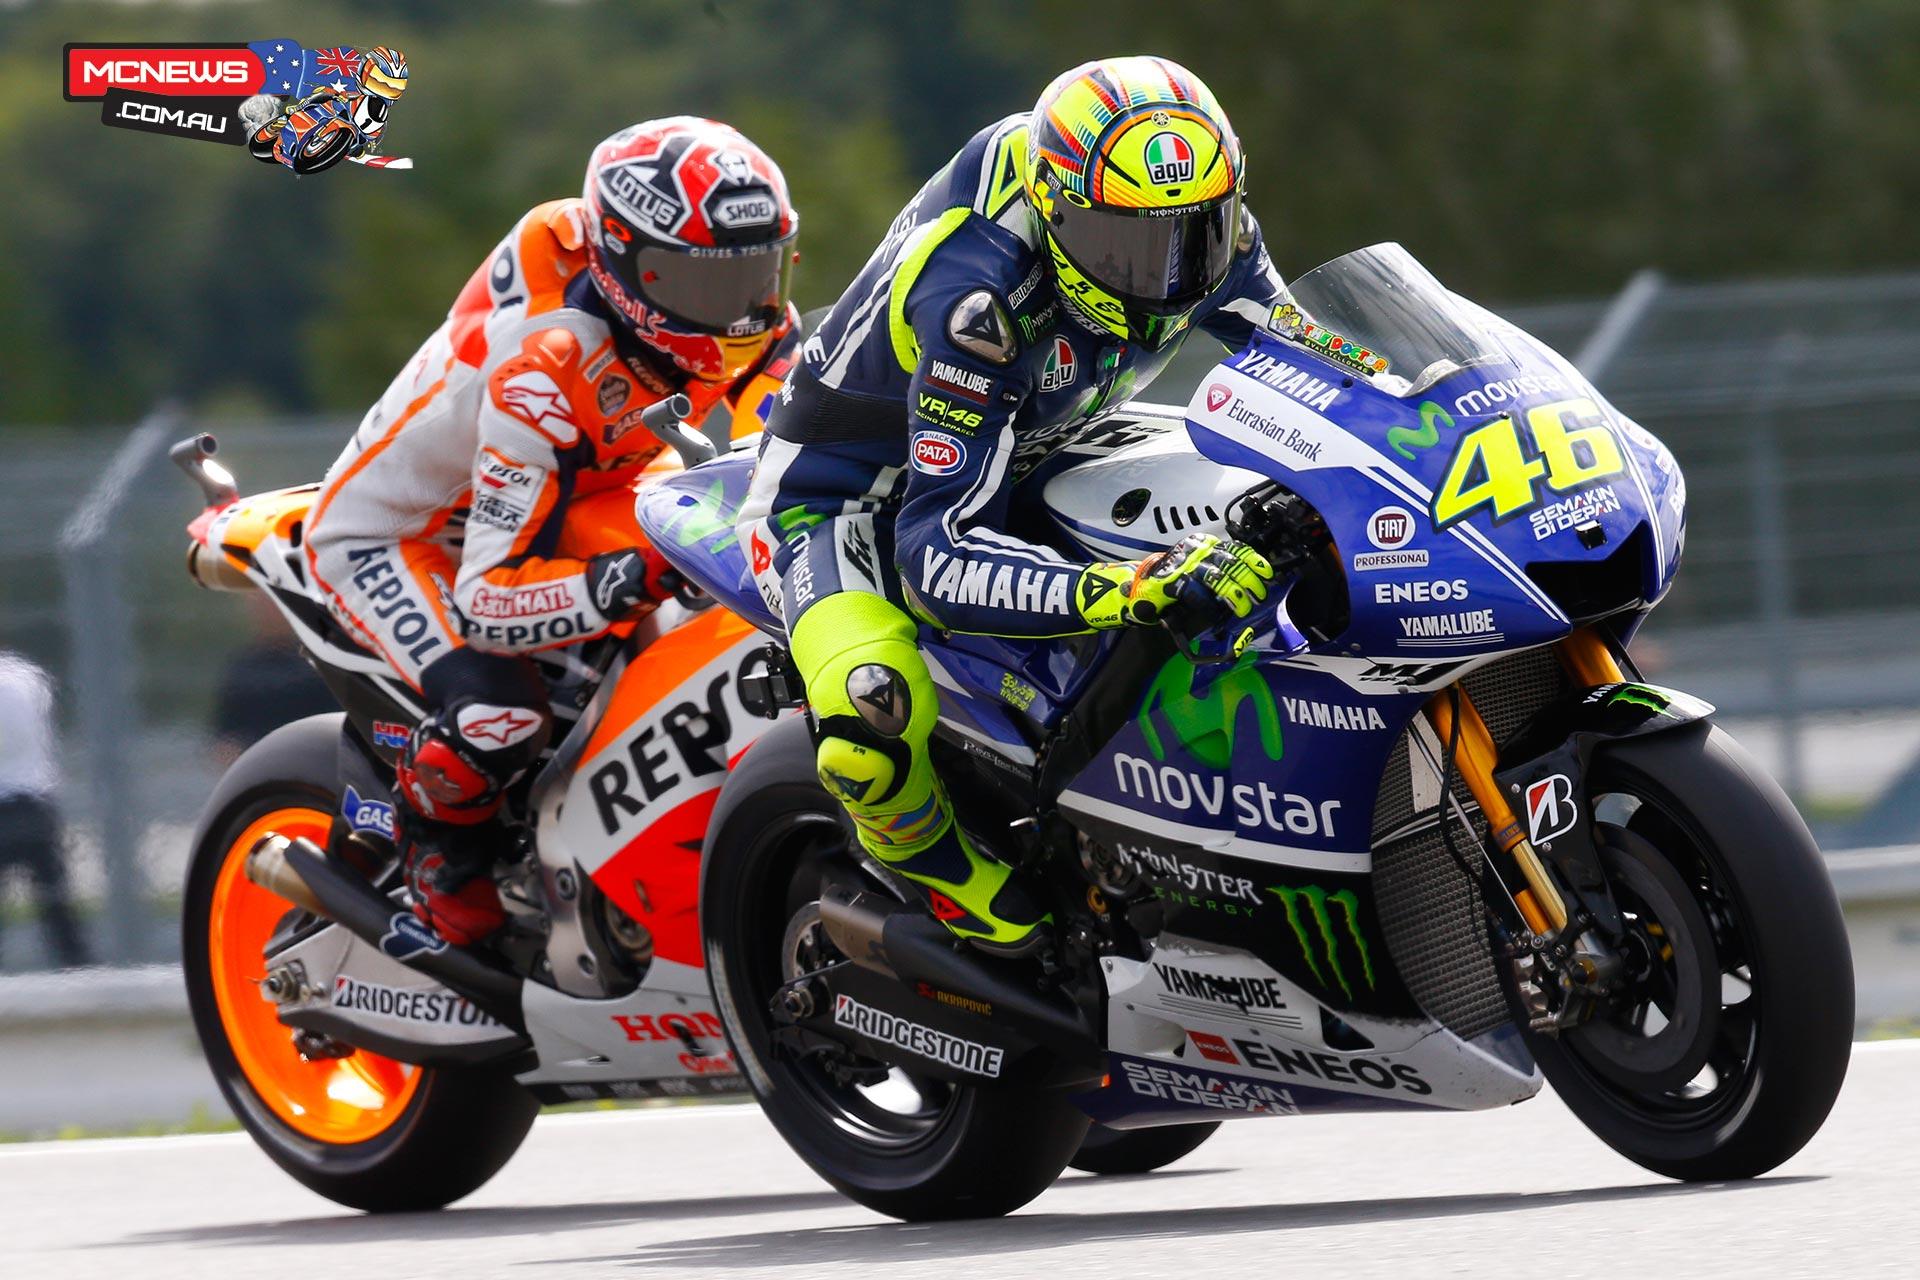 Riders talk ahead of Silverstone MotoGP | MCNews.com.au